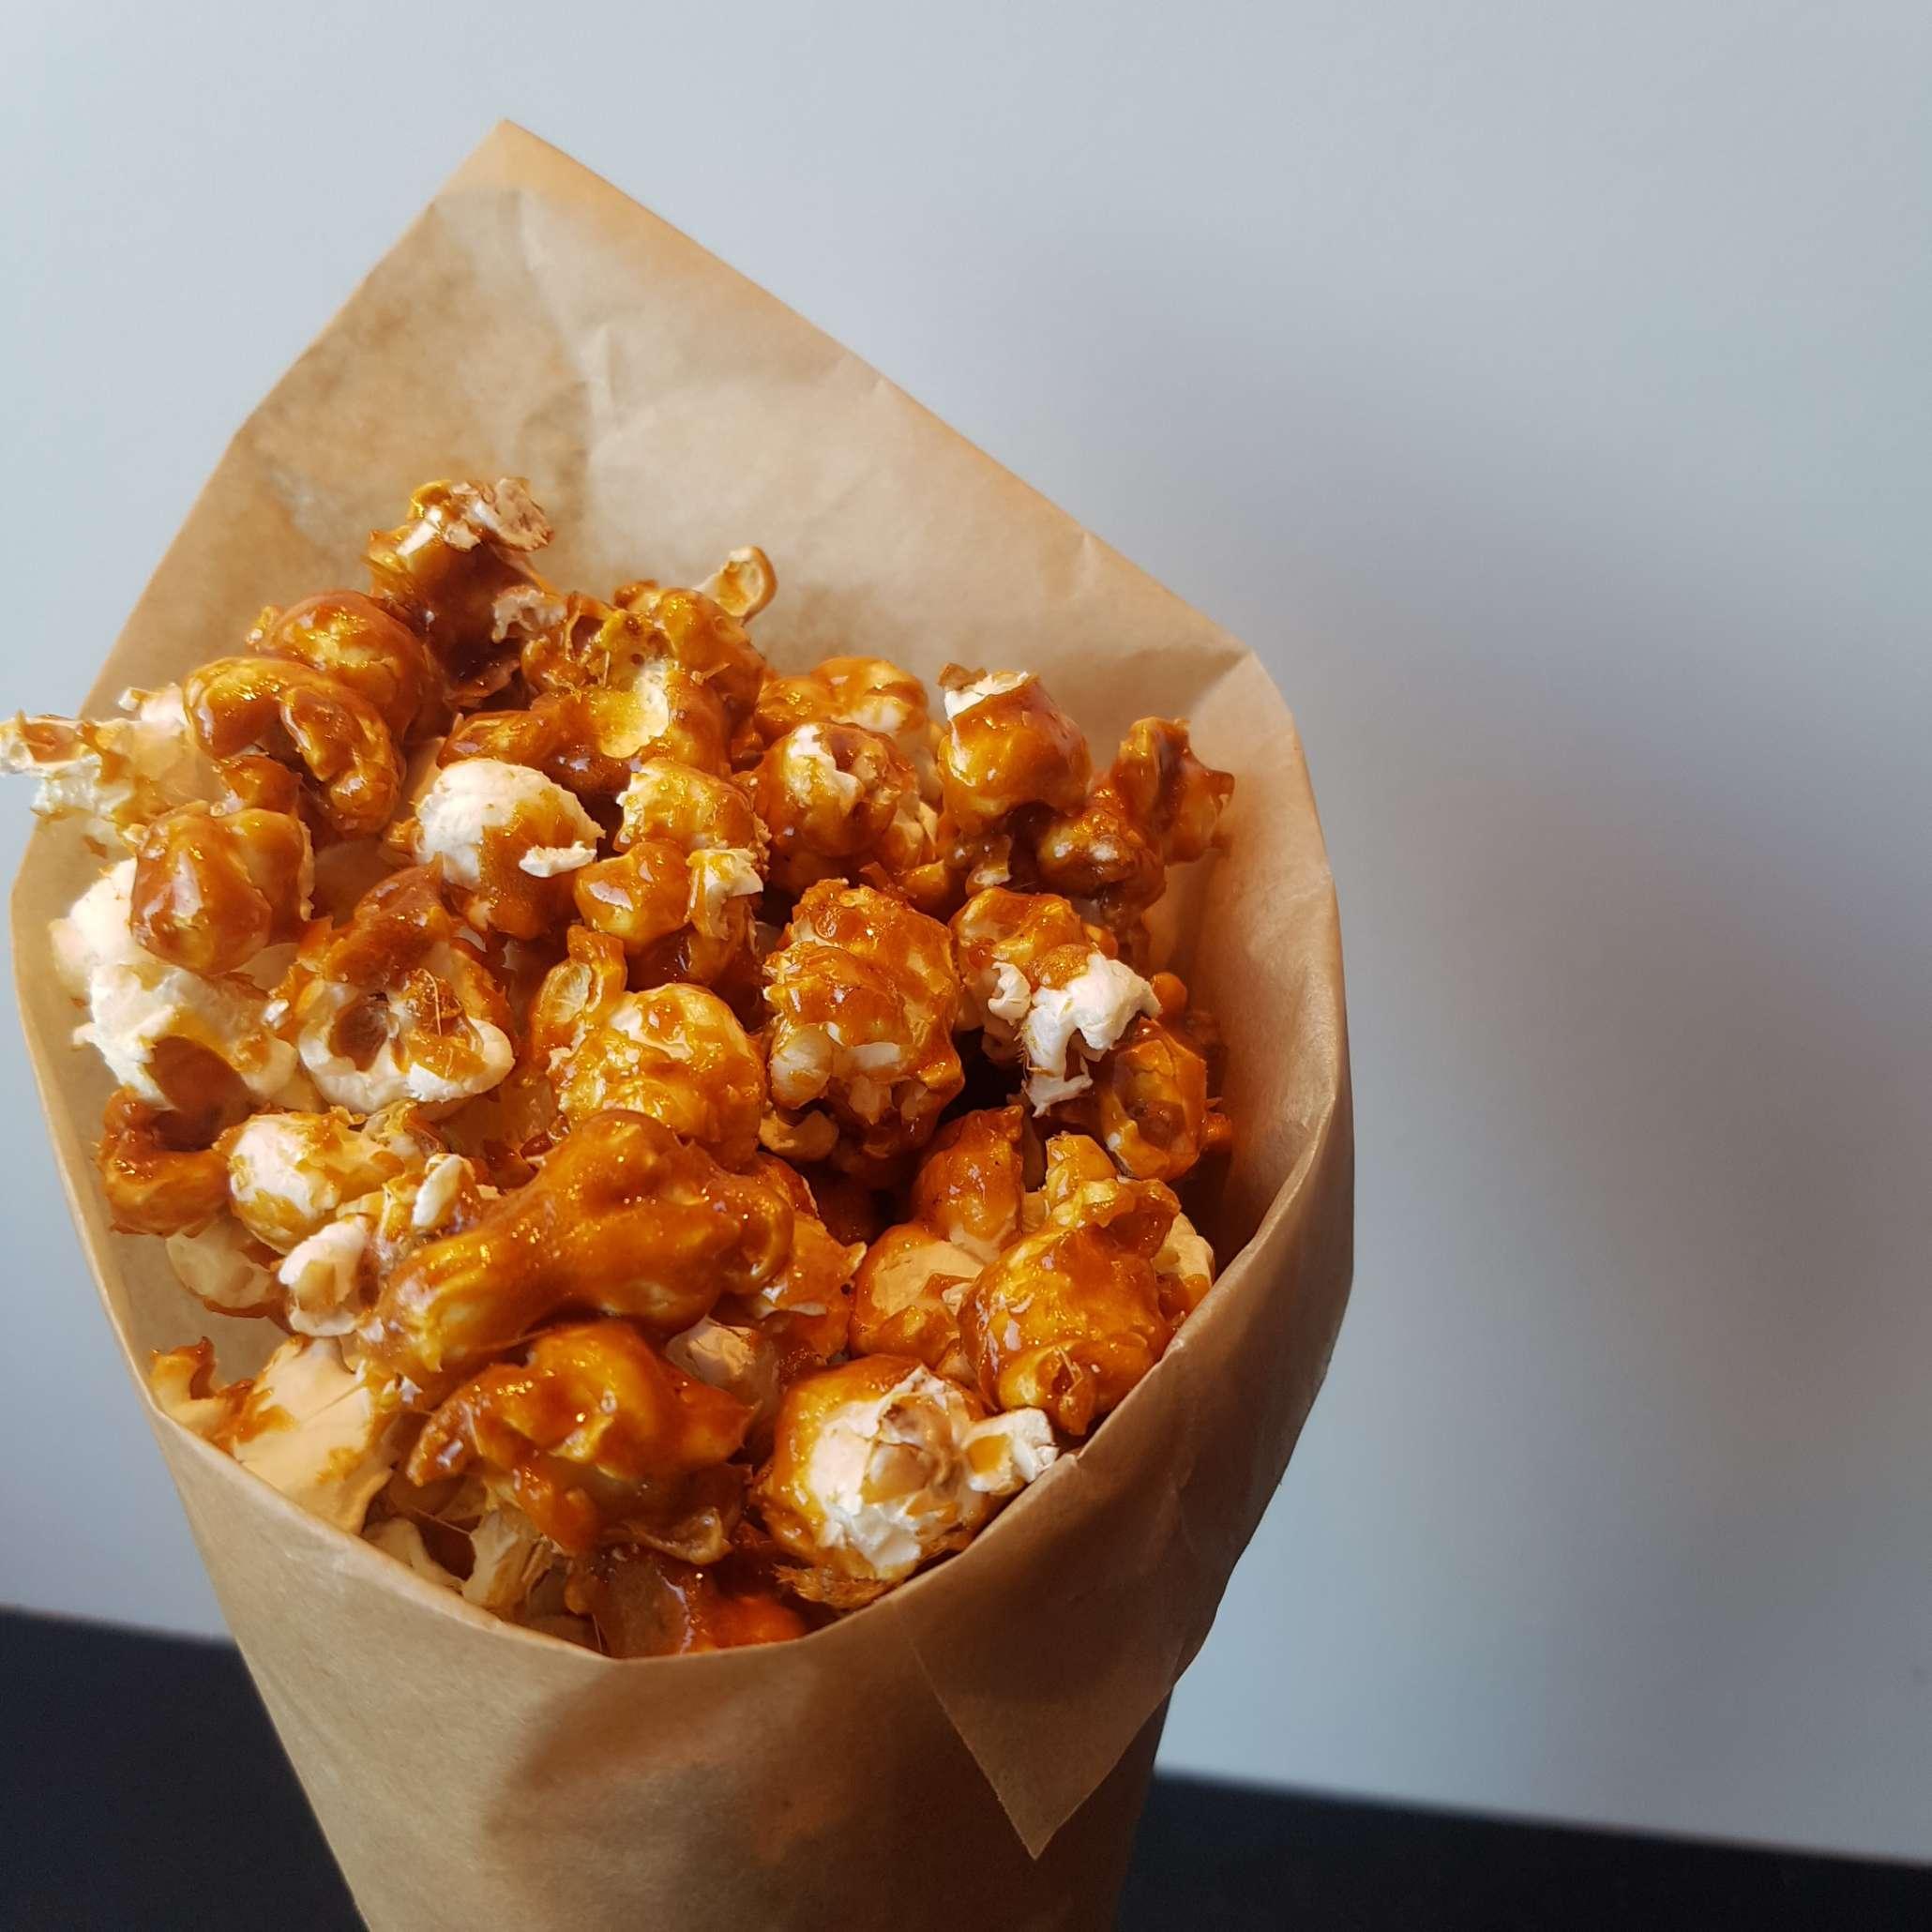 Saltet karamel popcorn, karameliseret popcorn opskrift